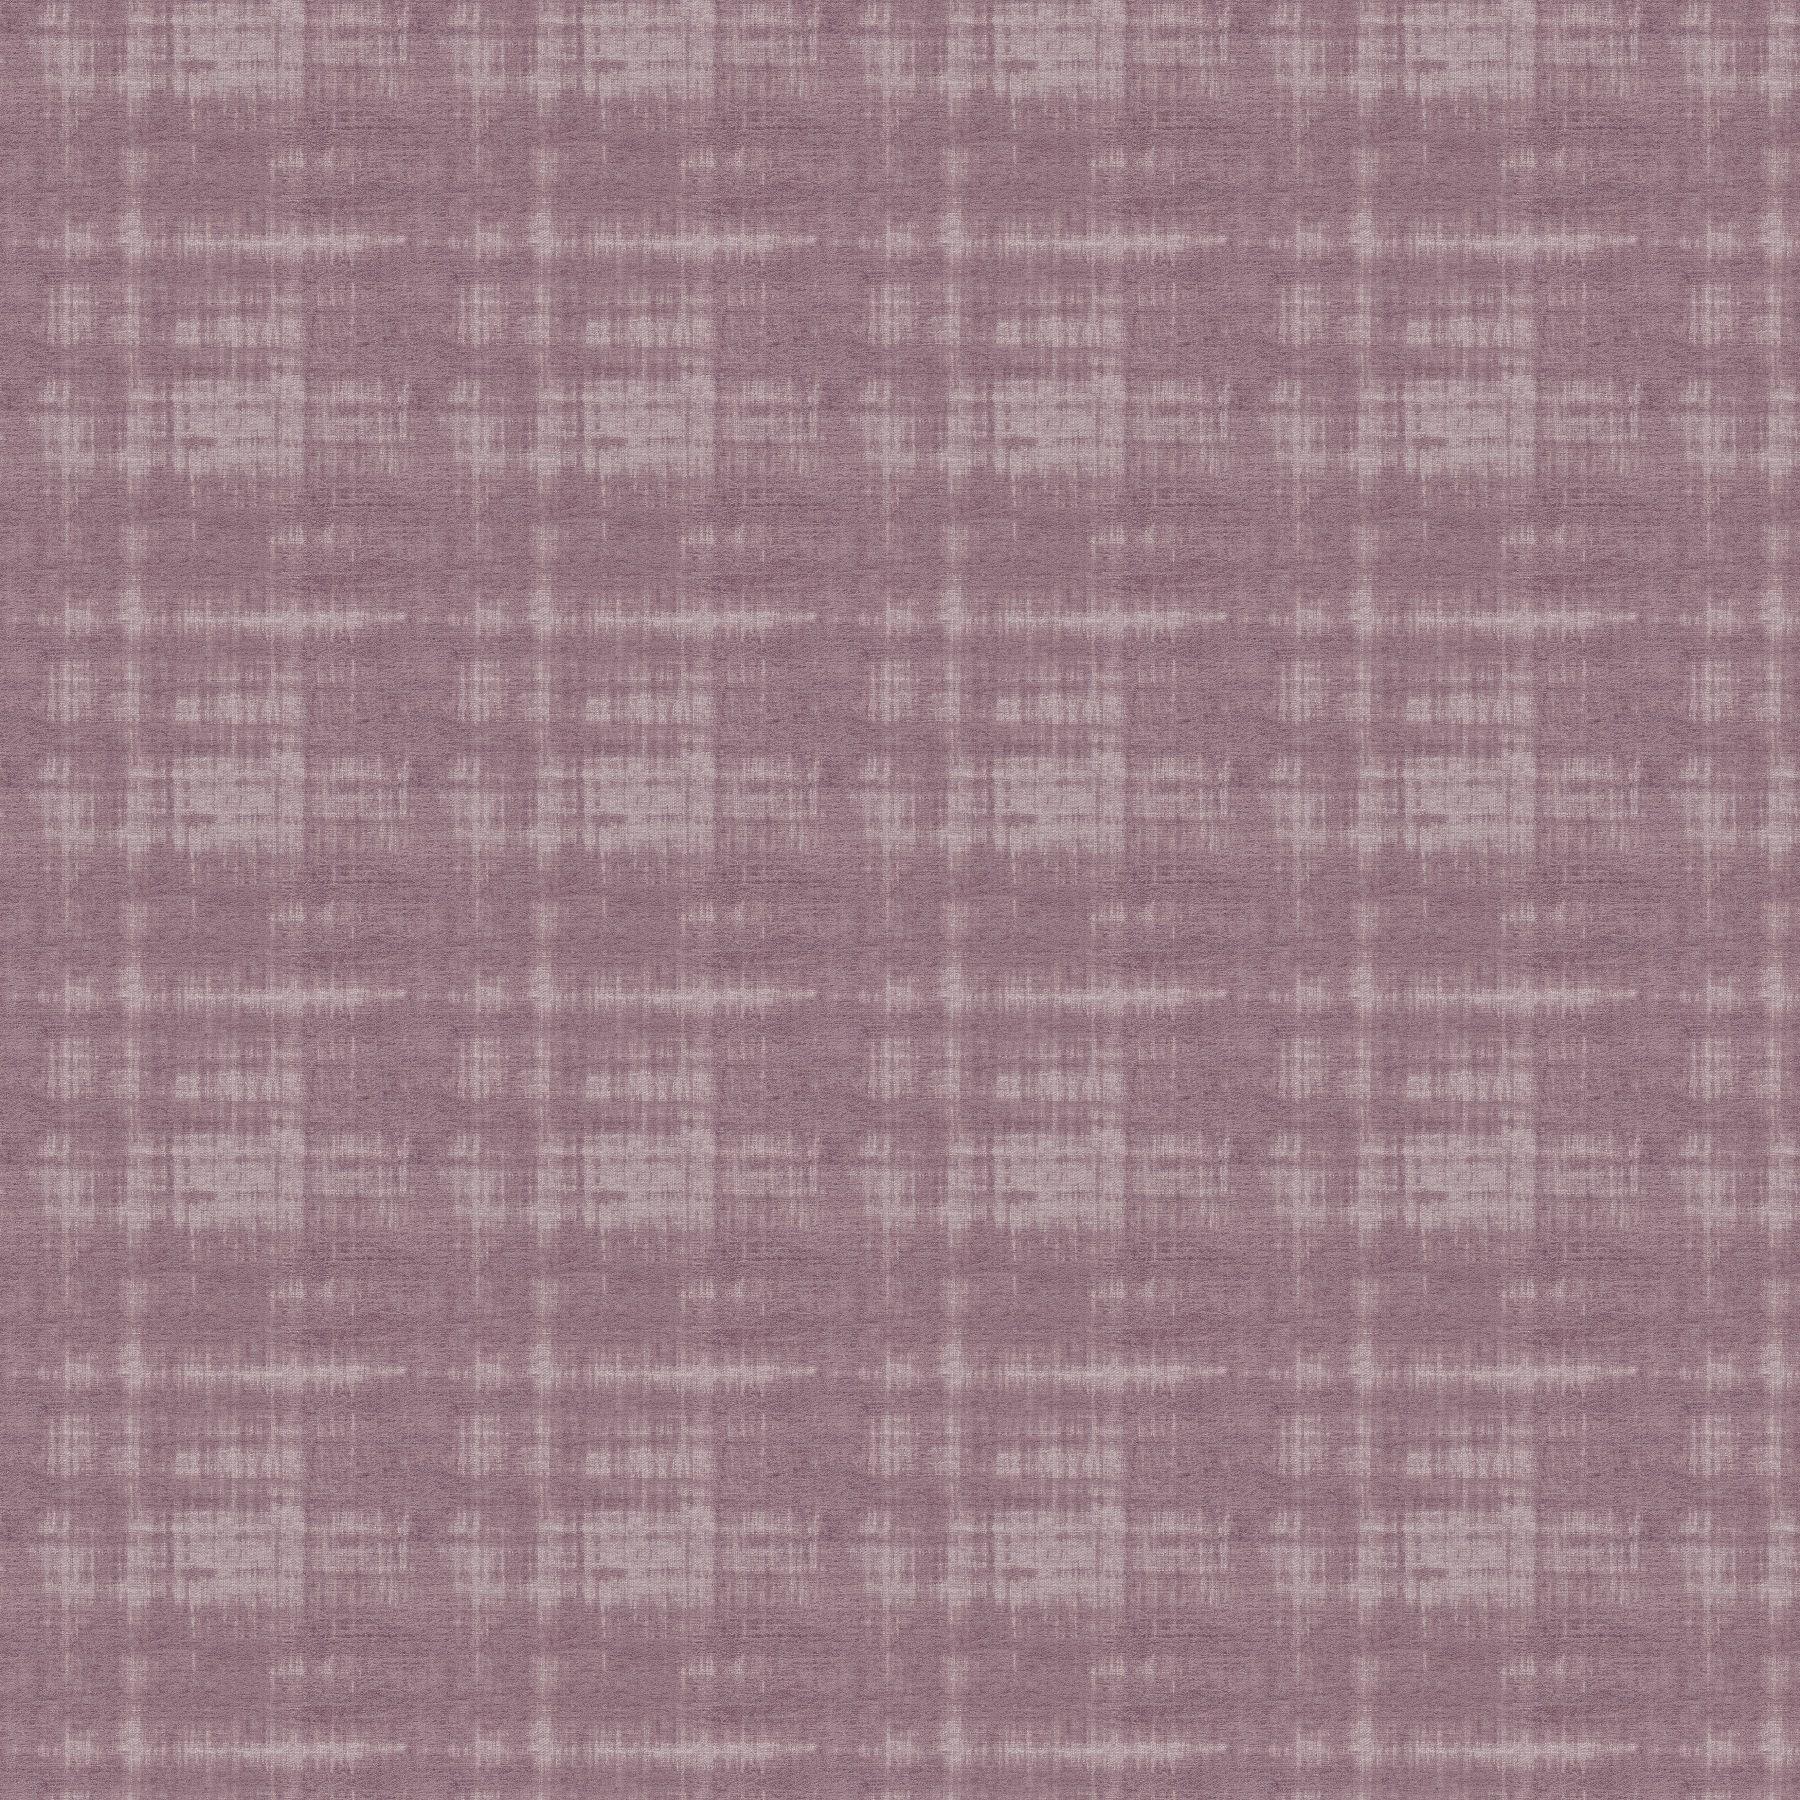 upholstery fabric notting hill 9 2282 060 jab anstoetz. Black Bedroom Furniture Sets. Home Design Ideas